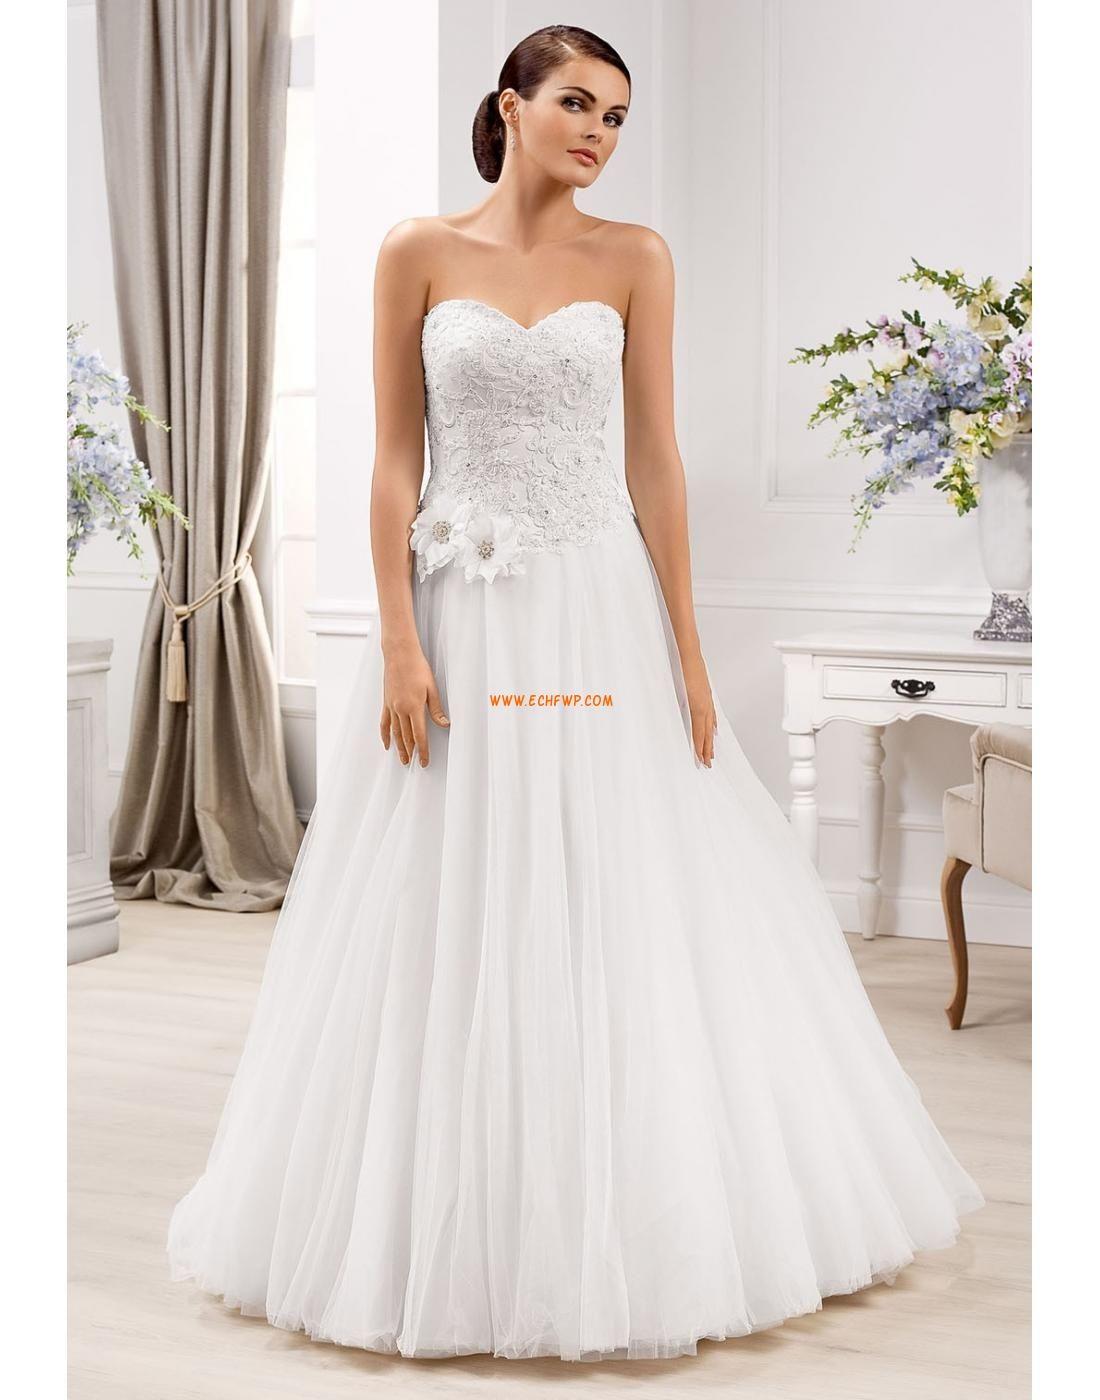 Golvlång Hjärtformad Ärmlös Bröllopsklänningar 2014 Šaty Na Country Svatbu bbfc116962